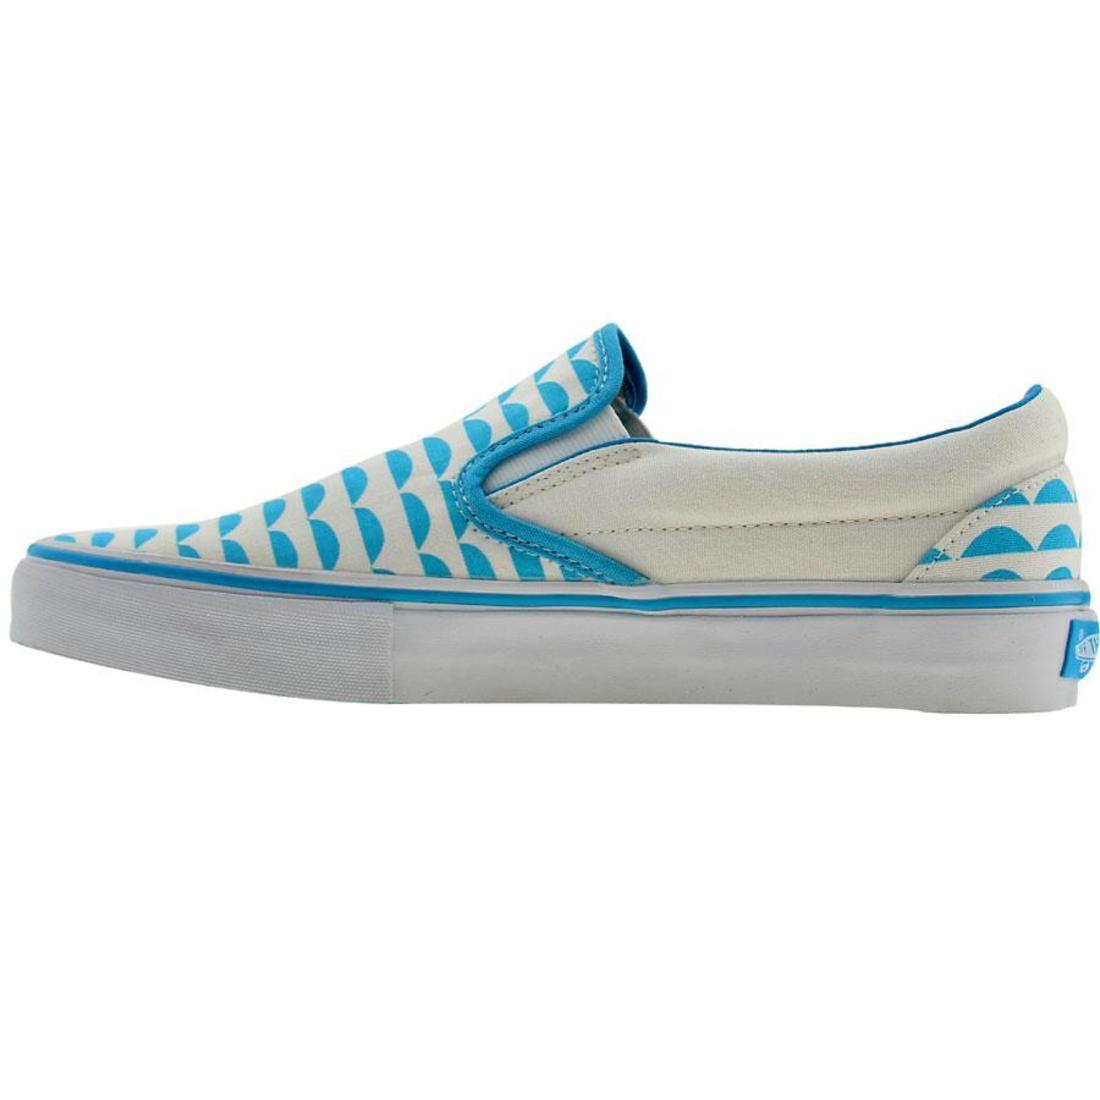 b4d77a376a22a6 Vans Classic Slip-On LX - Galinsky Waves (aquarius   t white) 5 5 of 7 ...